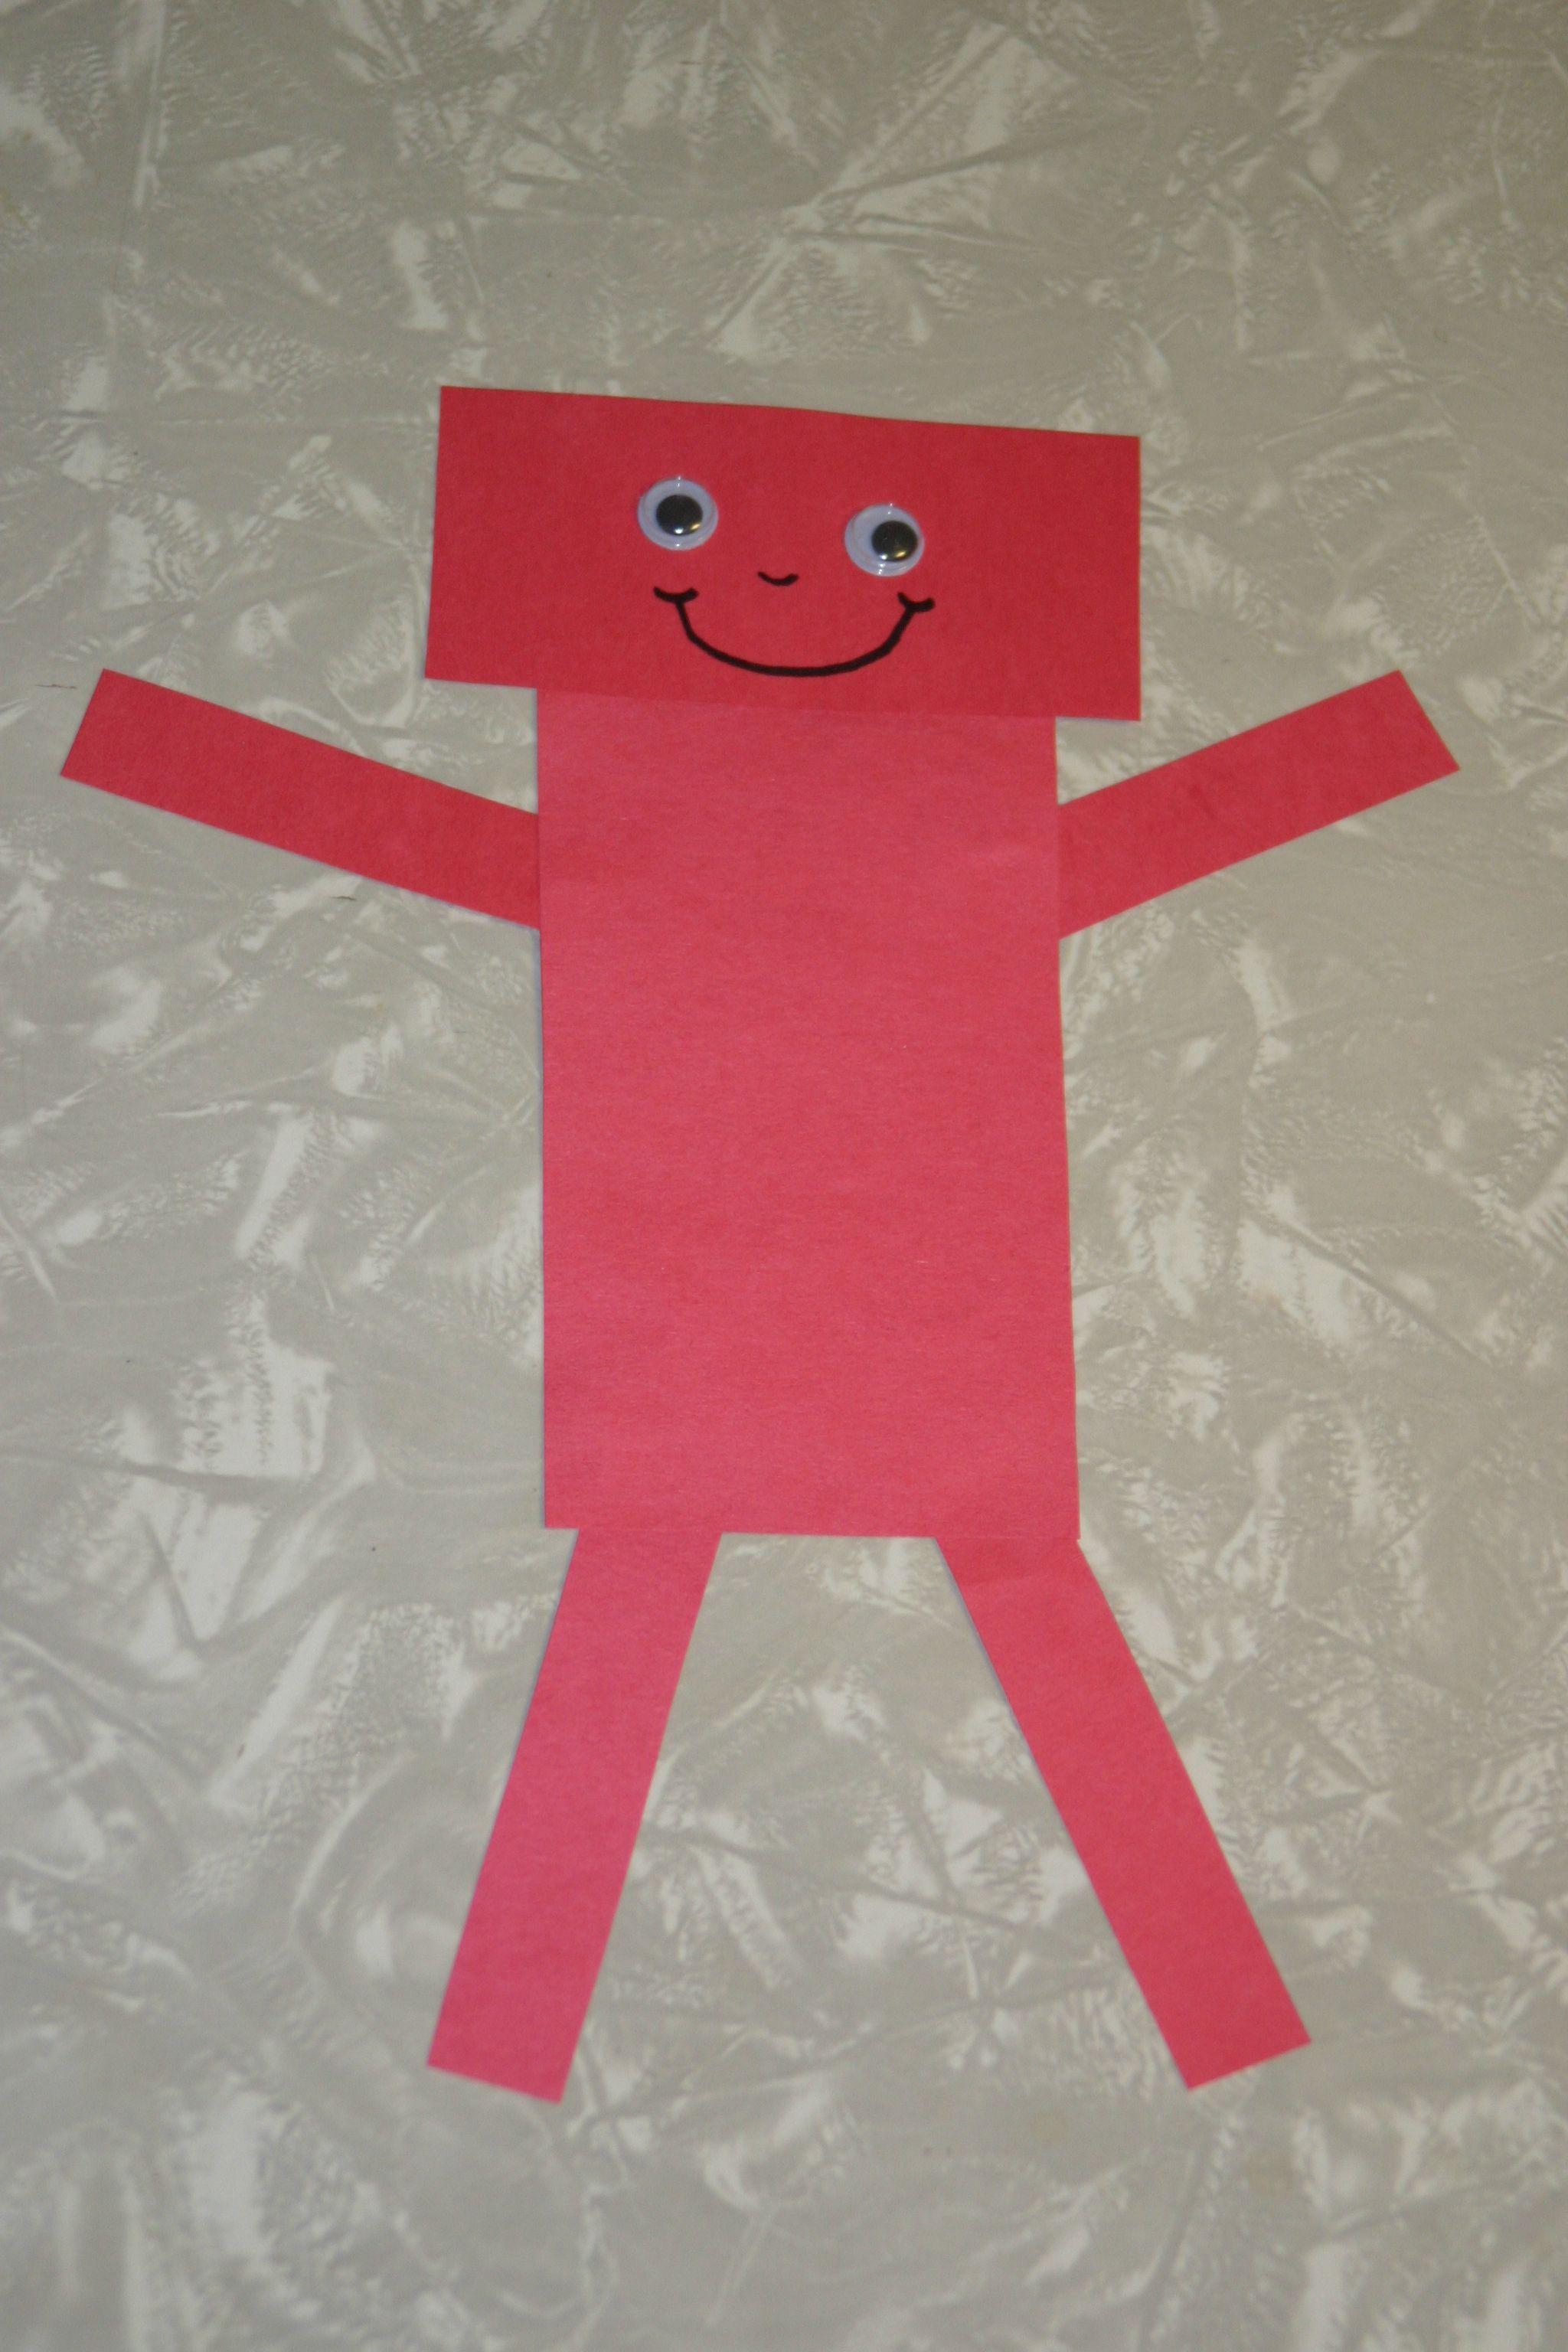 Red Rectangle Robot Craft Letter R Crafts Letter A Crafts